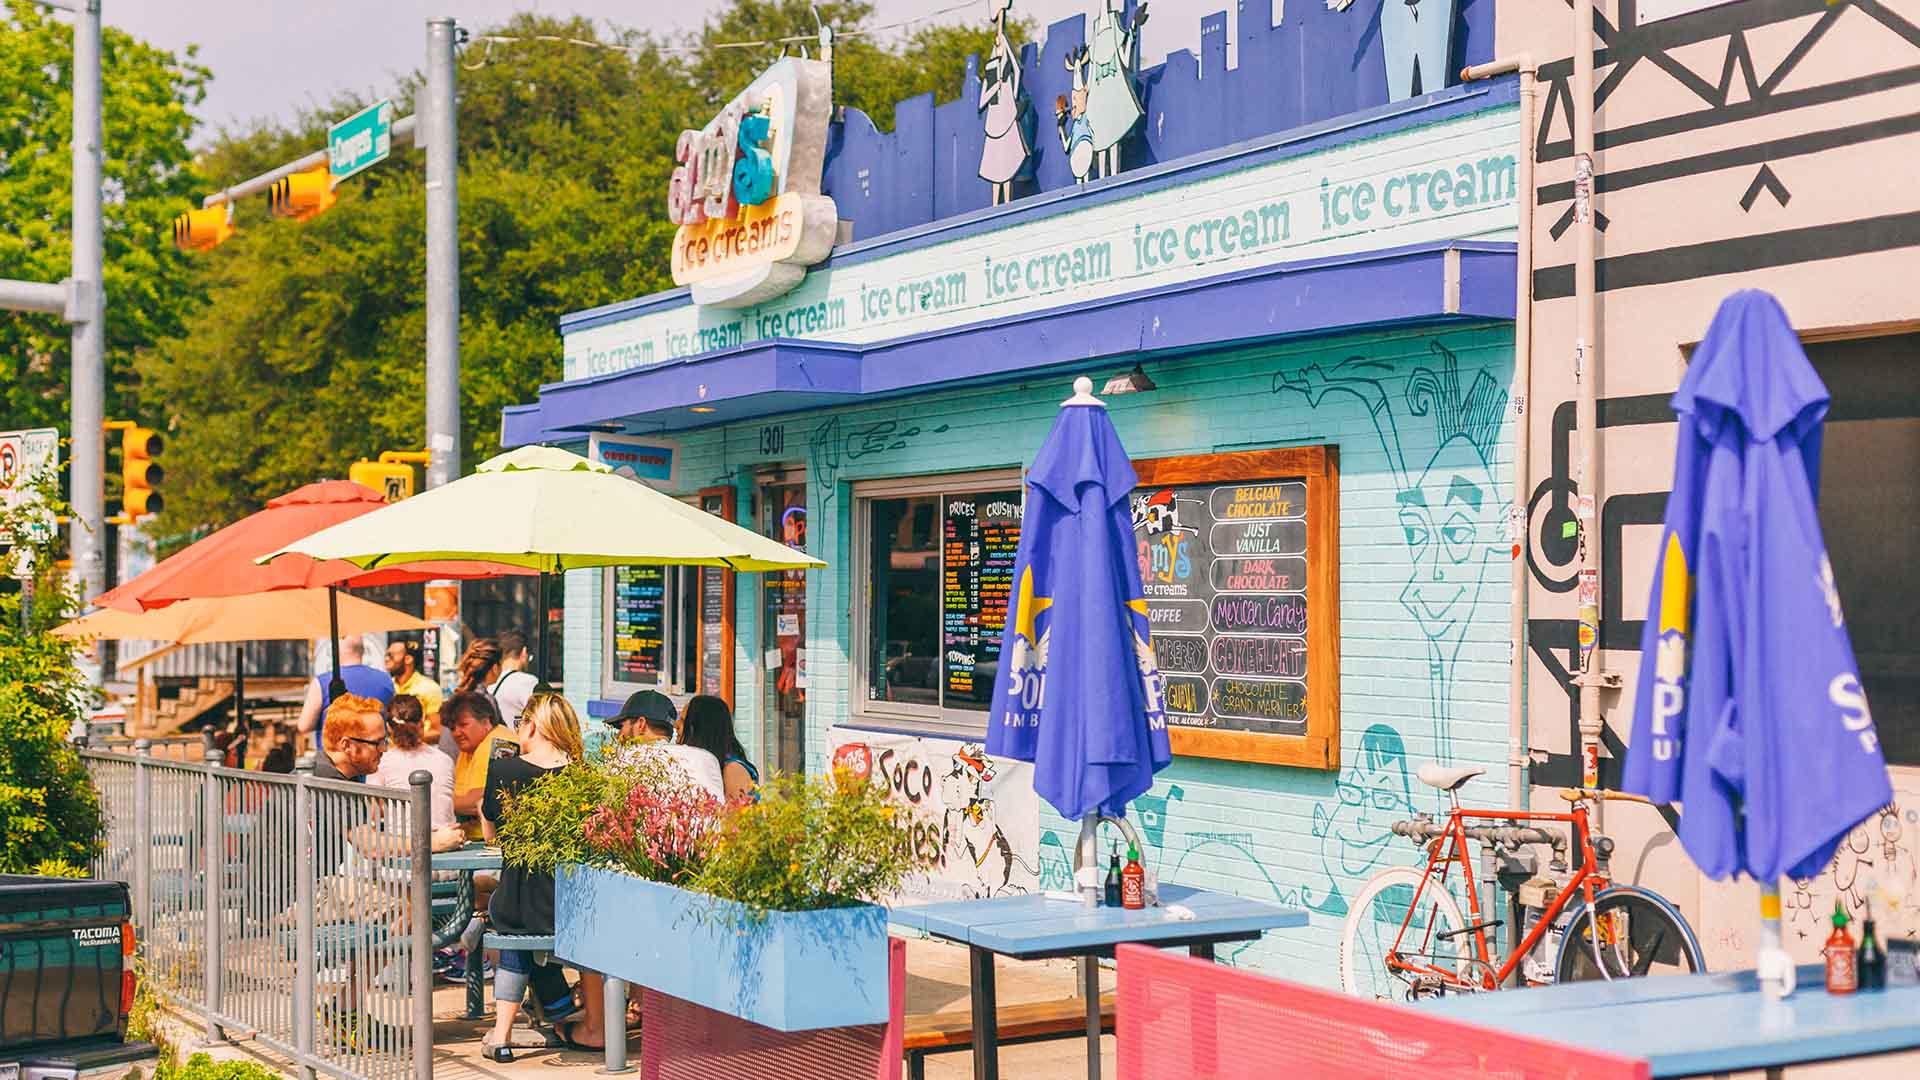 Image of South Congress Amys Ice Cream